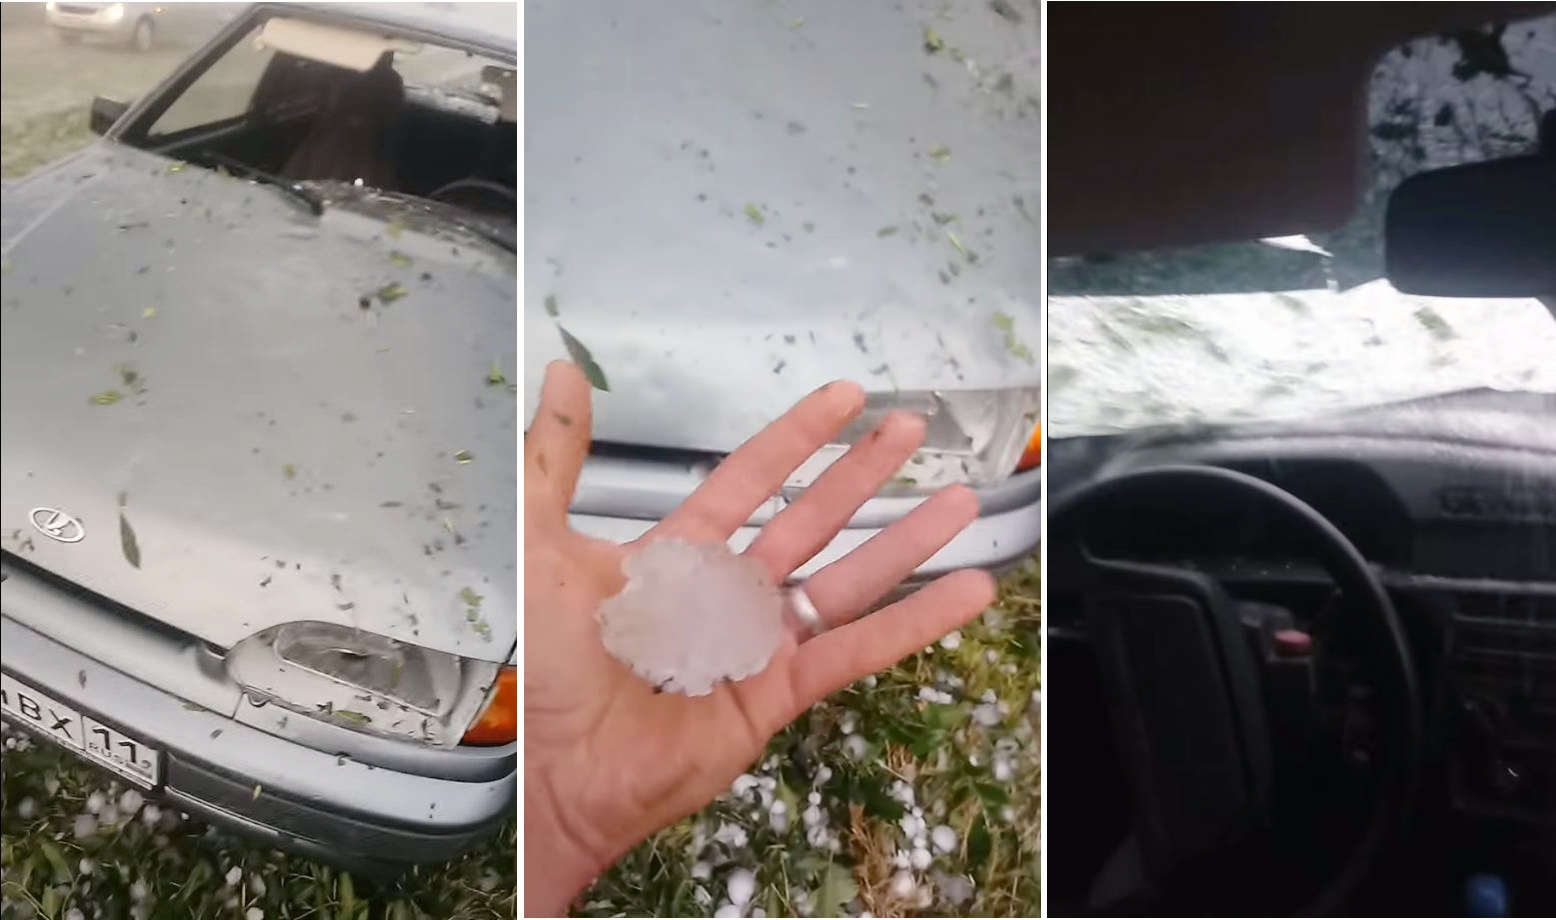 Photo of Χαλάζι σε μέγεθος ροδάκινου καταστρέφει ένα αυτοκίνητο [vid]